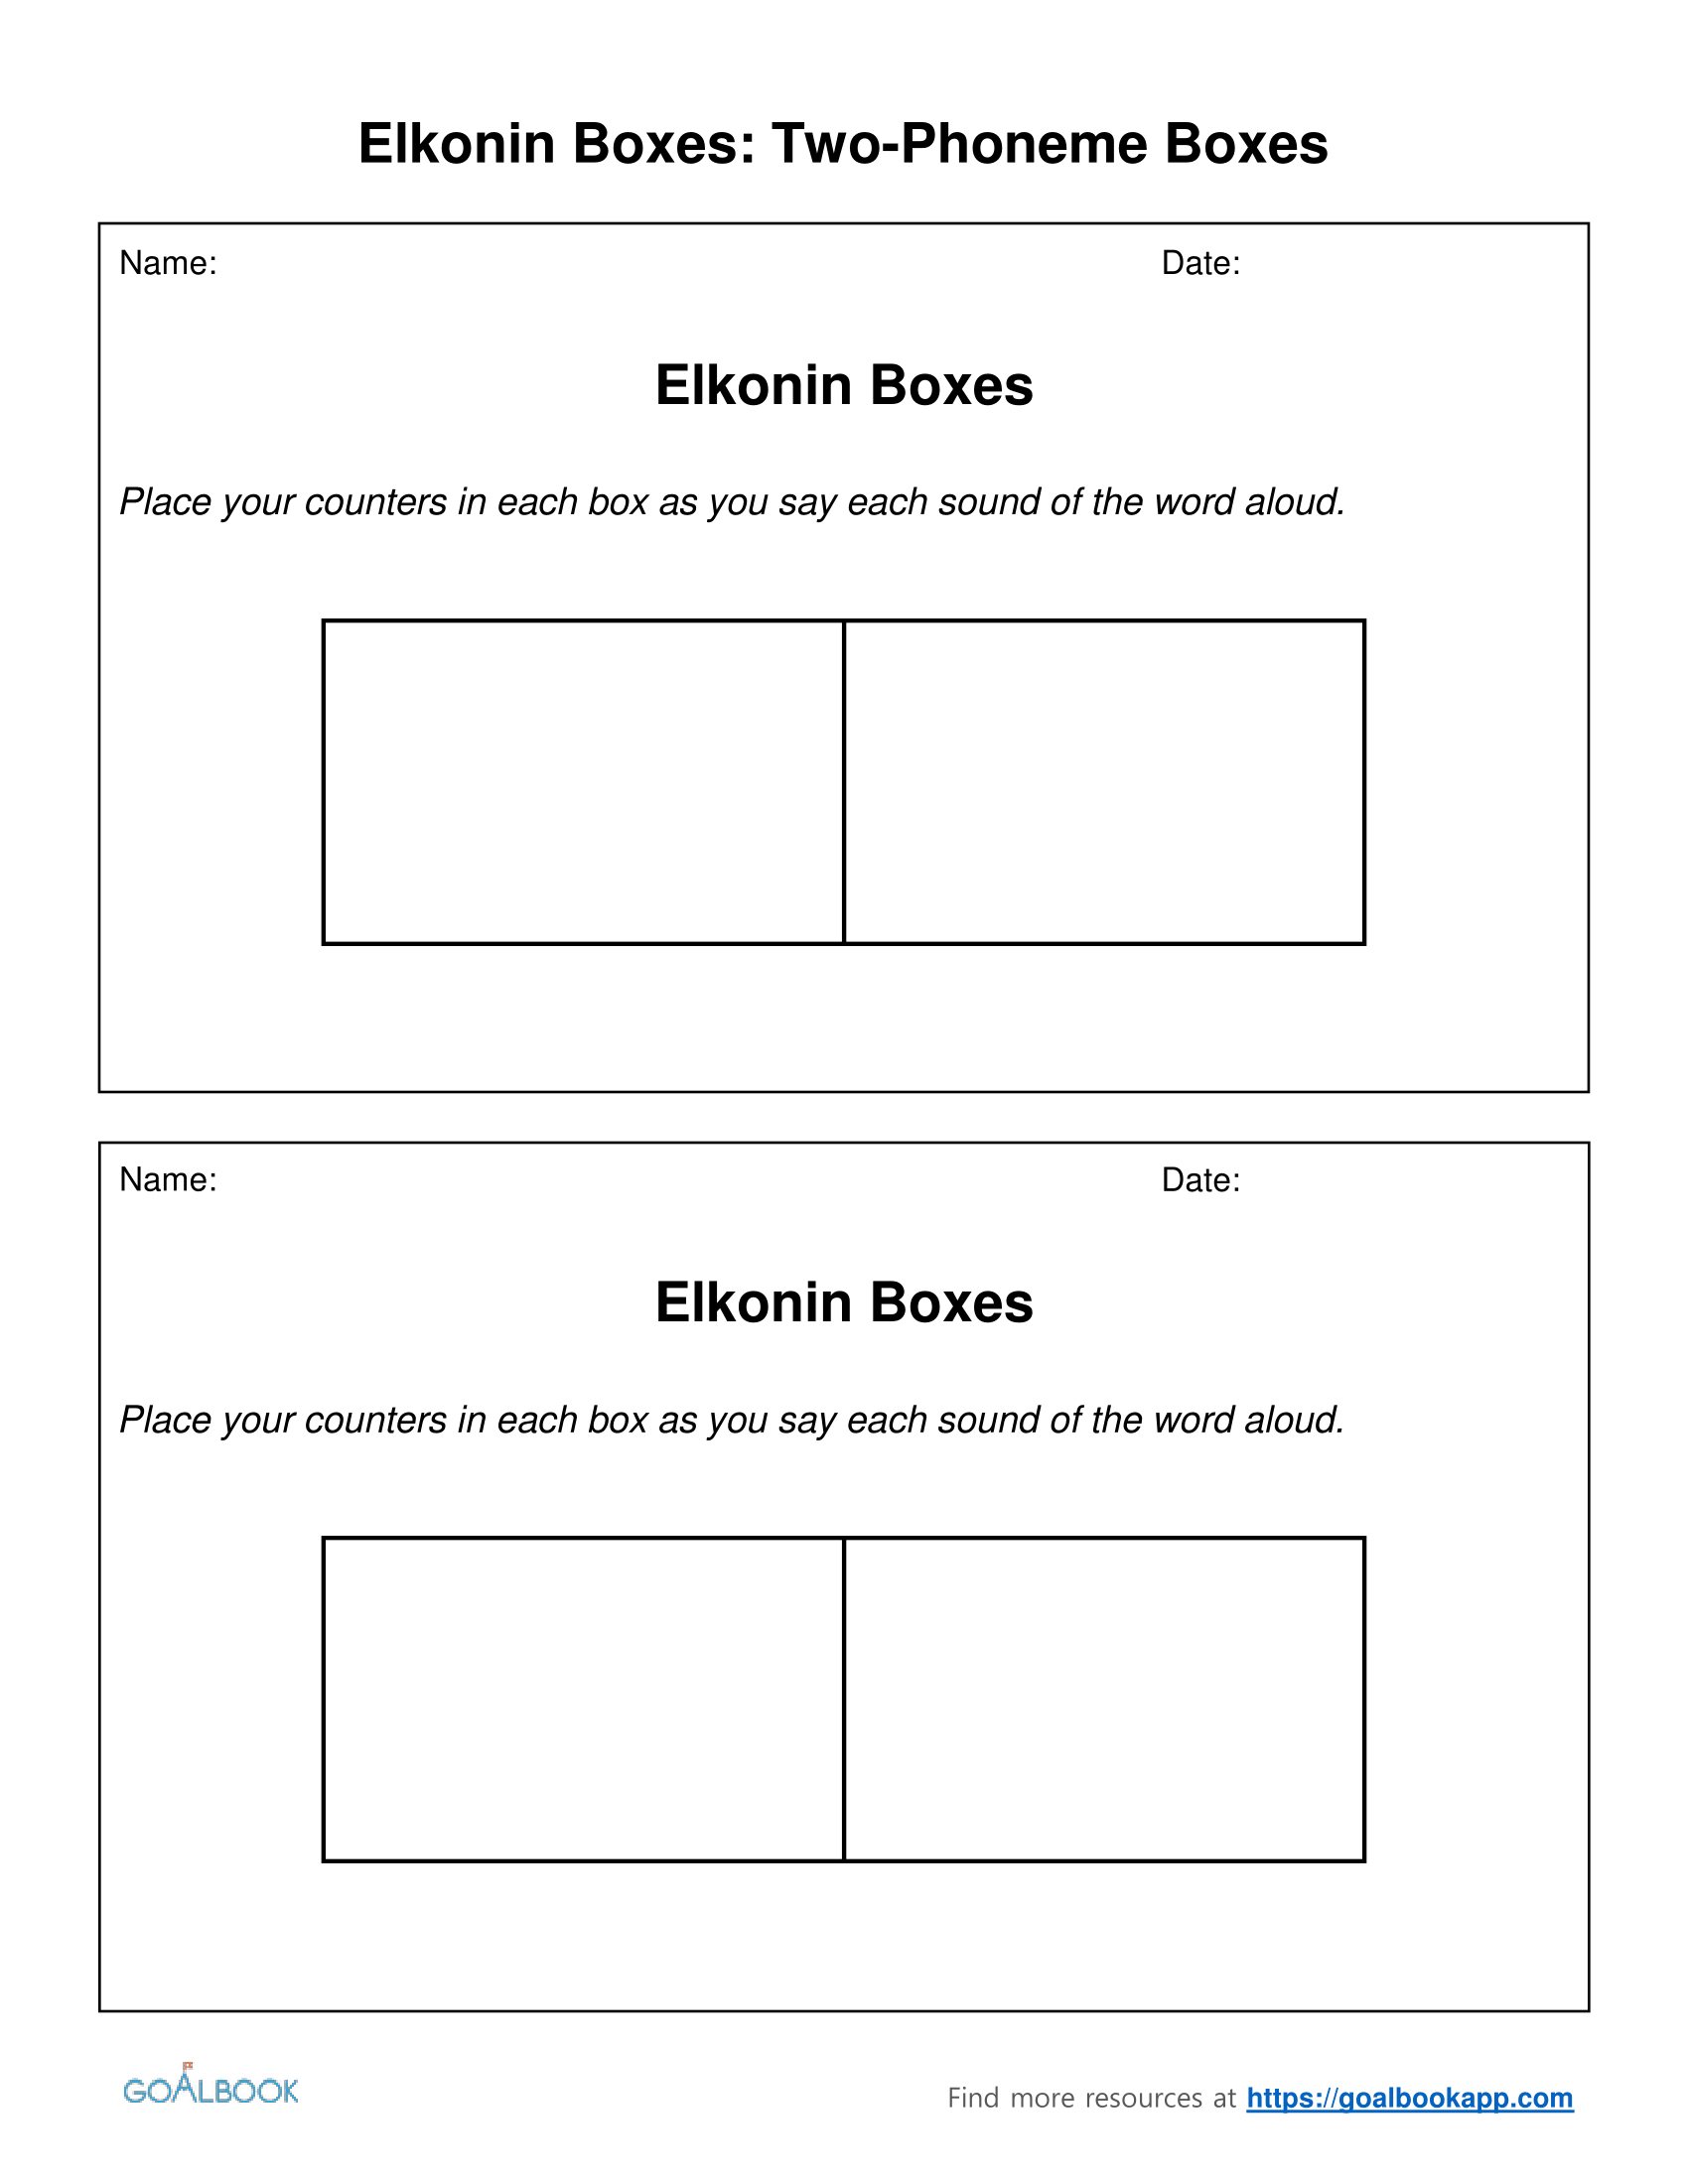 Pretty Elkonin Bo Template Images Gallery. 16 Elkonin Bo Template - Free Printable Elkonin Boxes